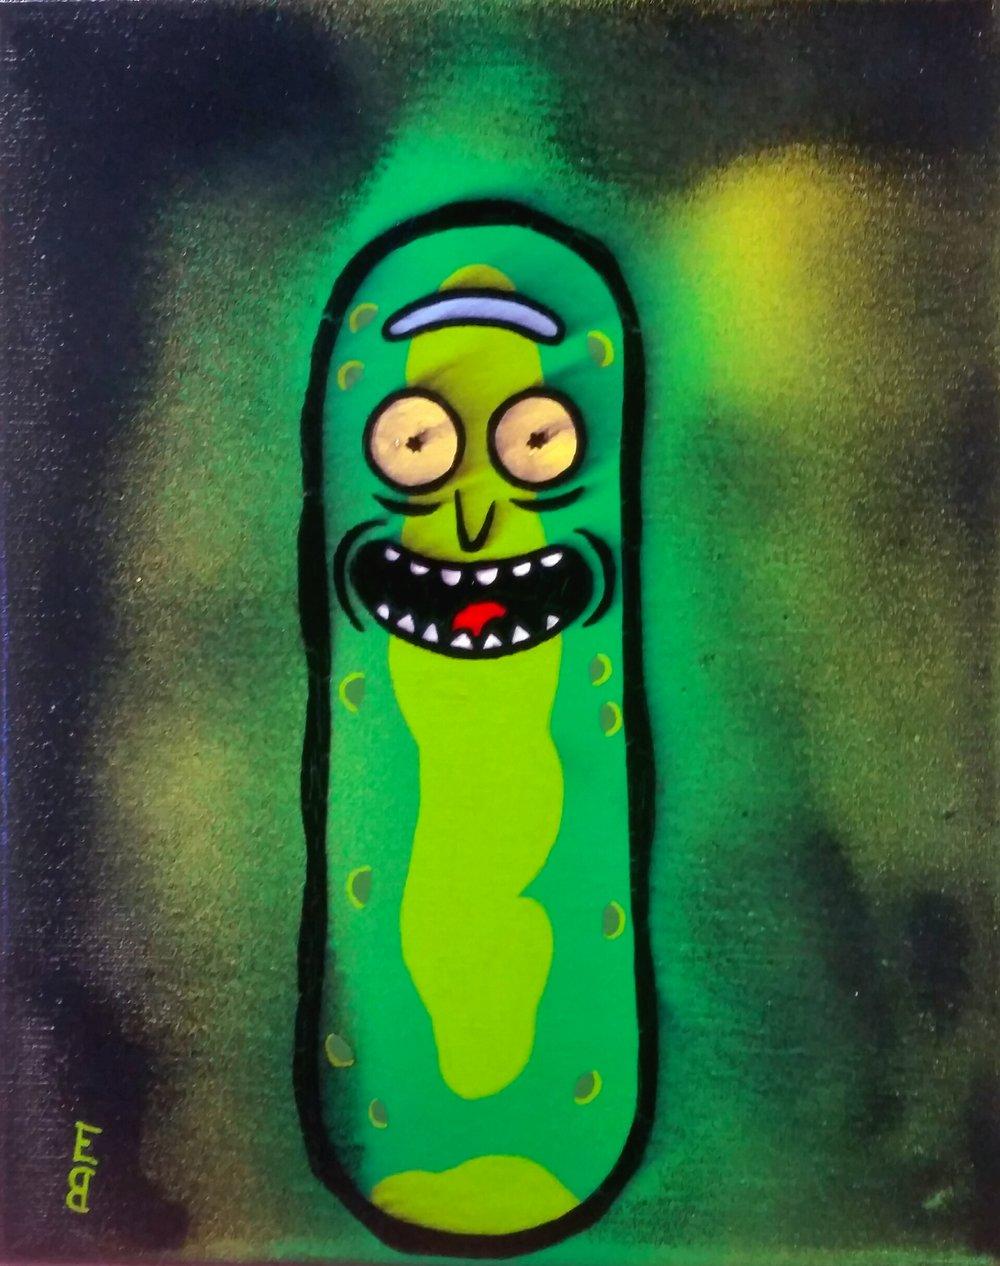 Pickle RIIICK!